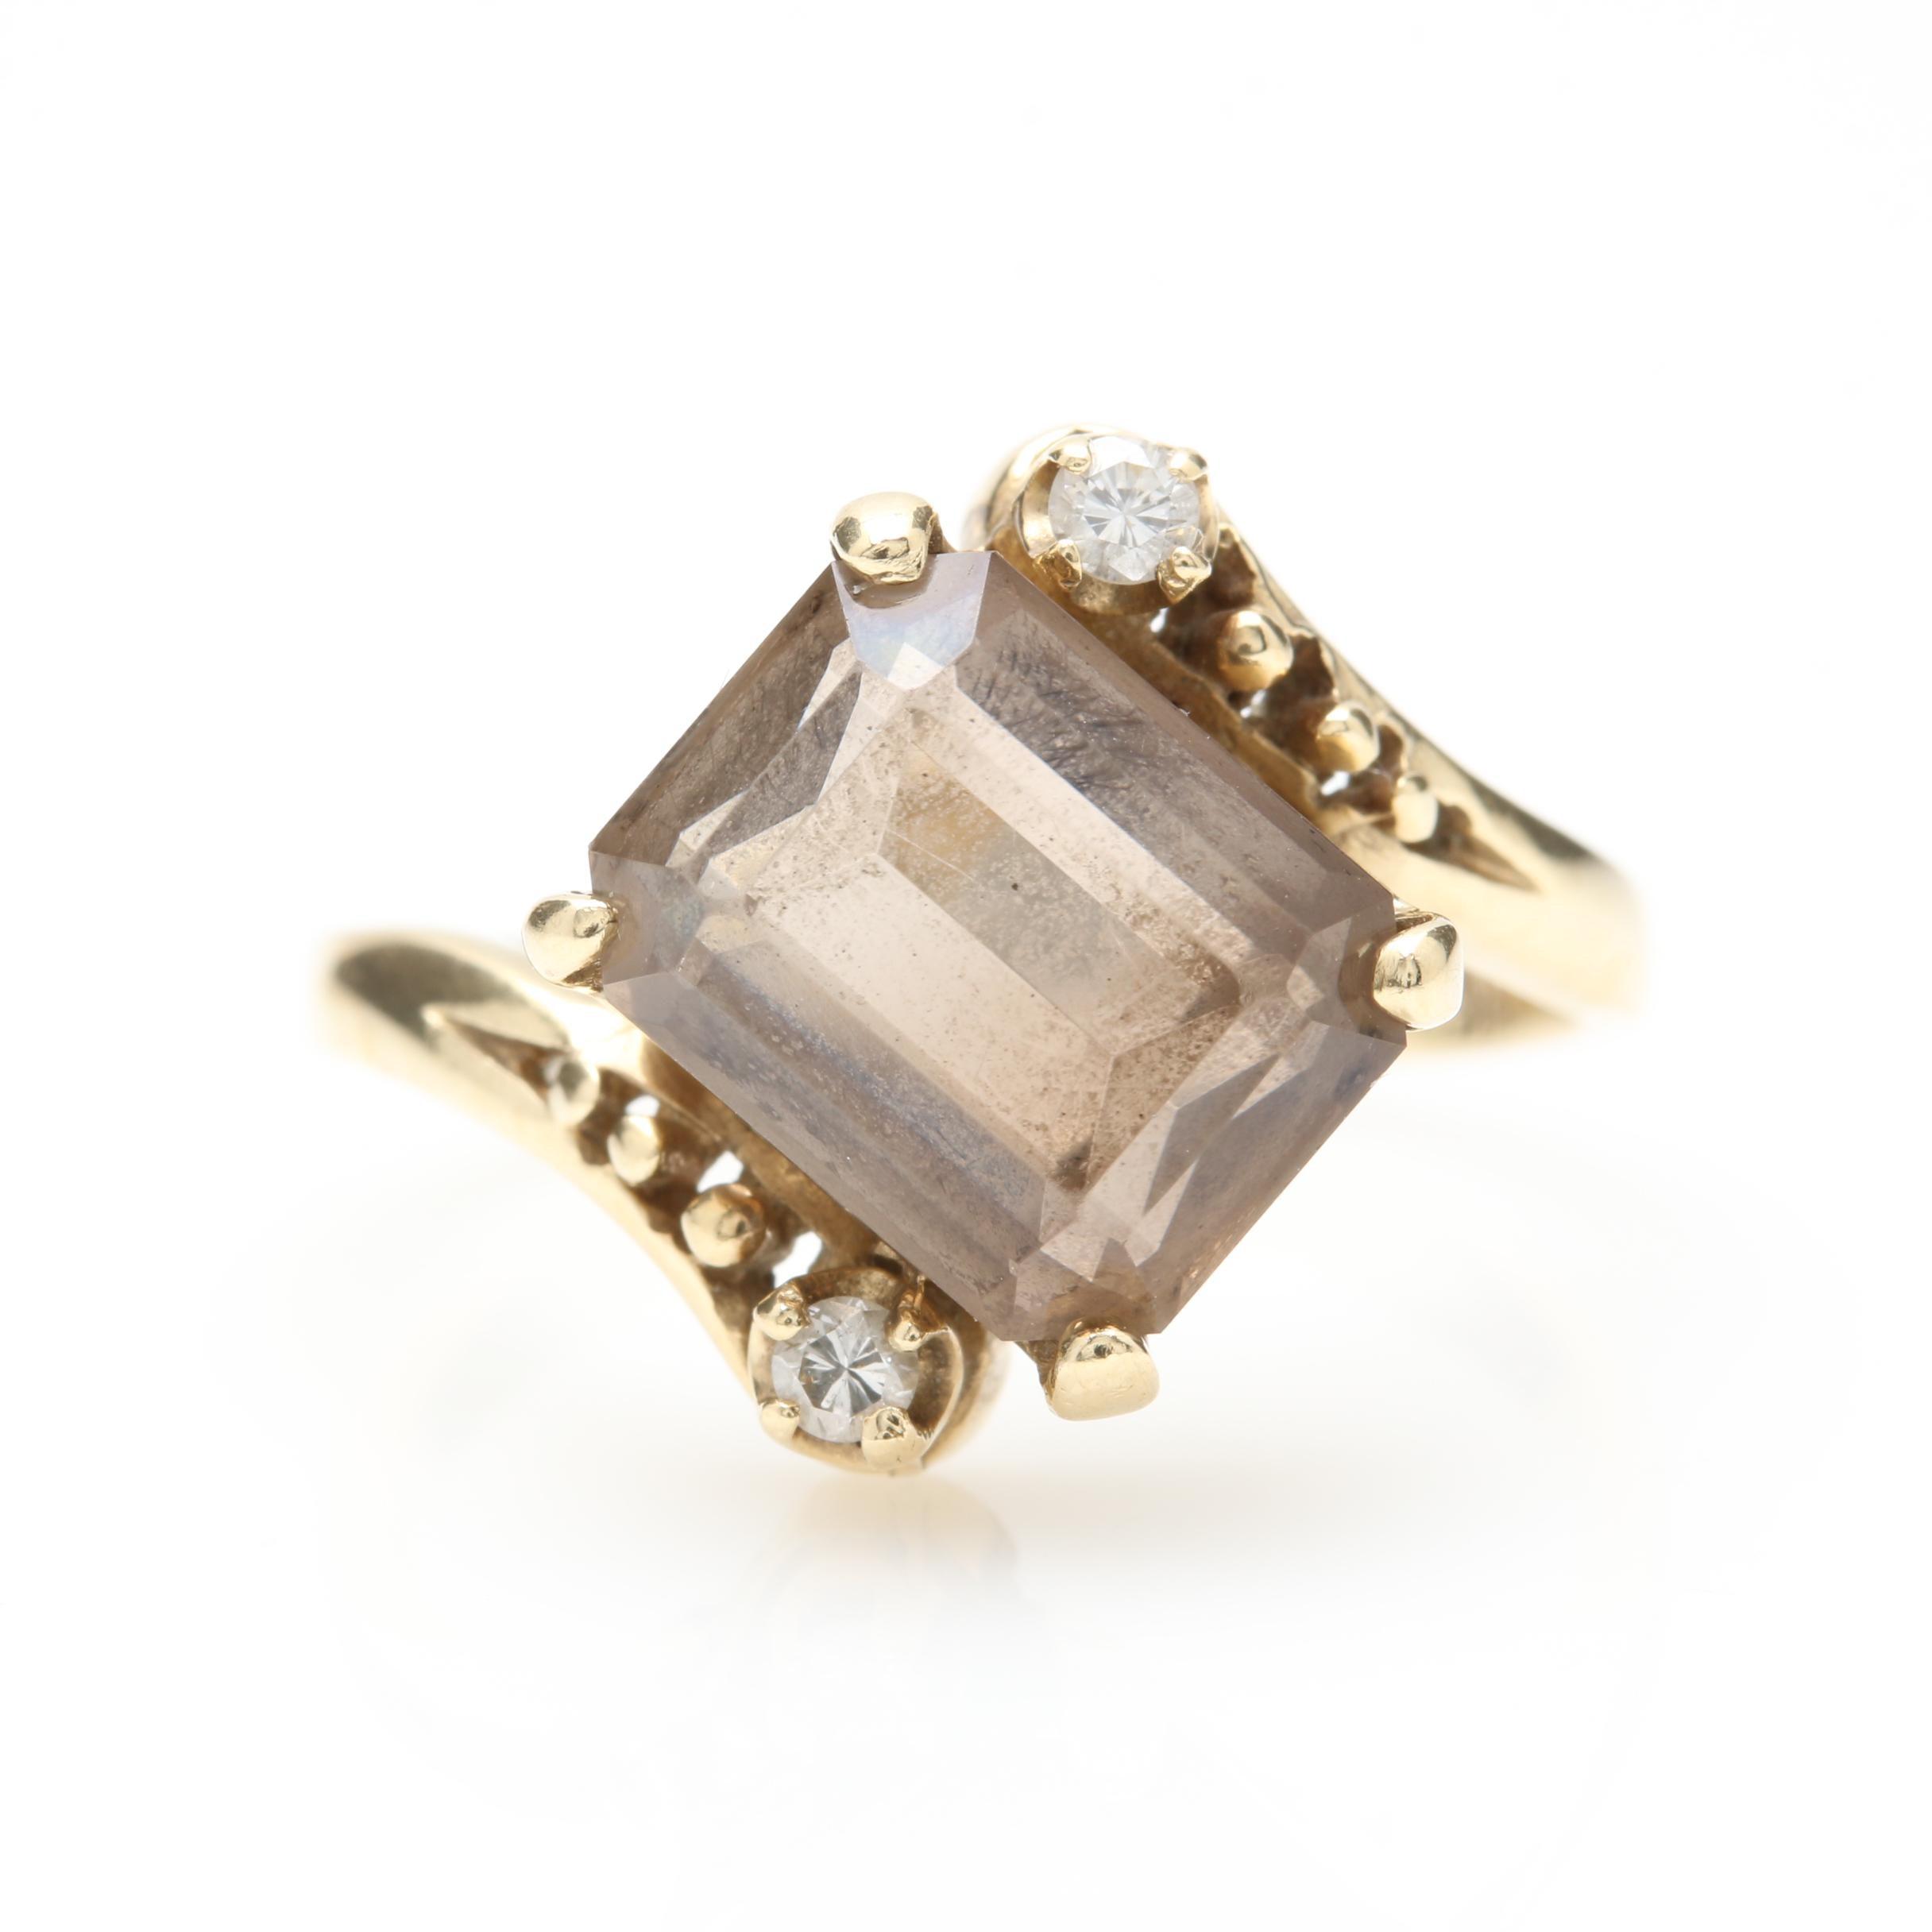 Vintage 14K Yellow Gold Smoky Quartz and Diamond Ring